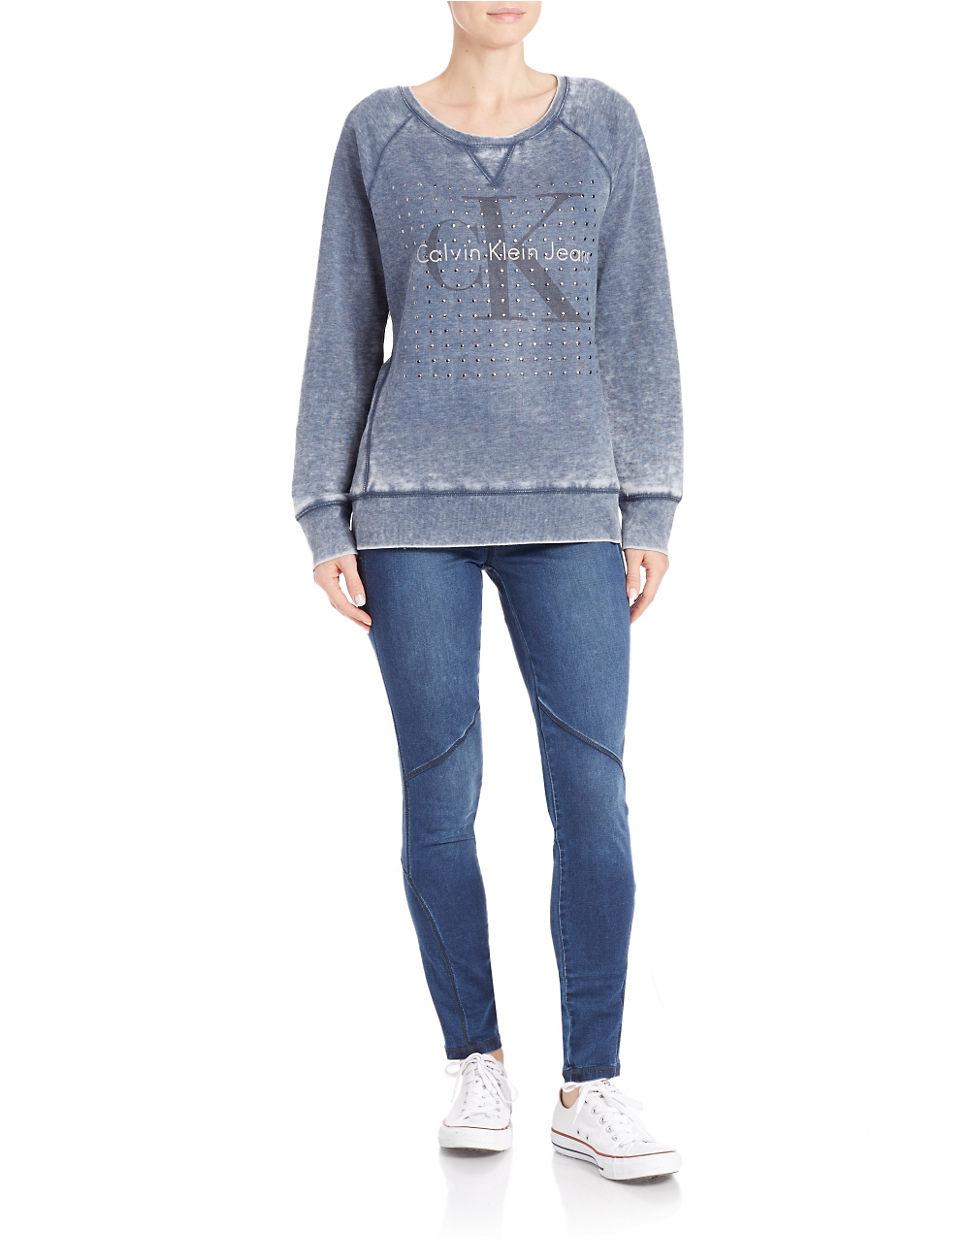 calvin klein jeans studded distressed raglan sweatshirt in. Black Bedroom Furniture Sets. Home Design Ideas